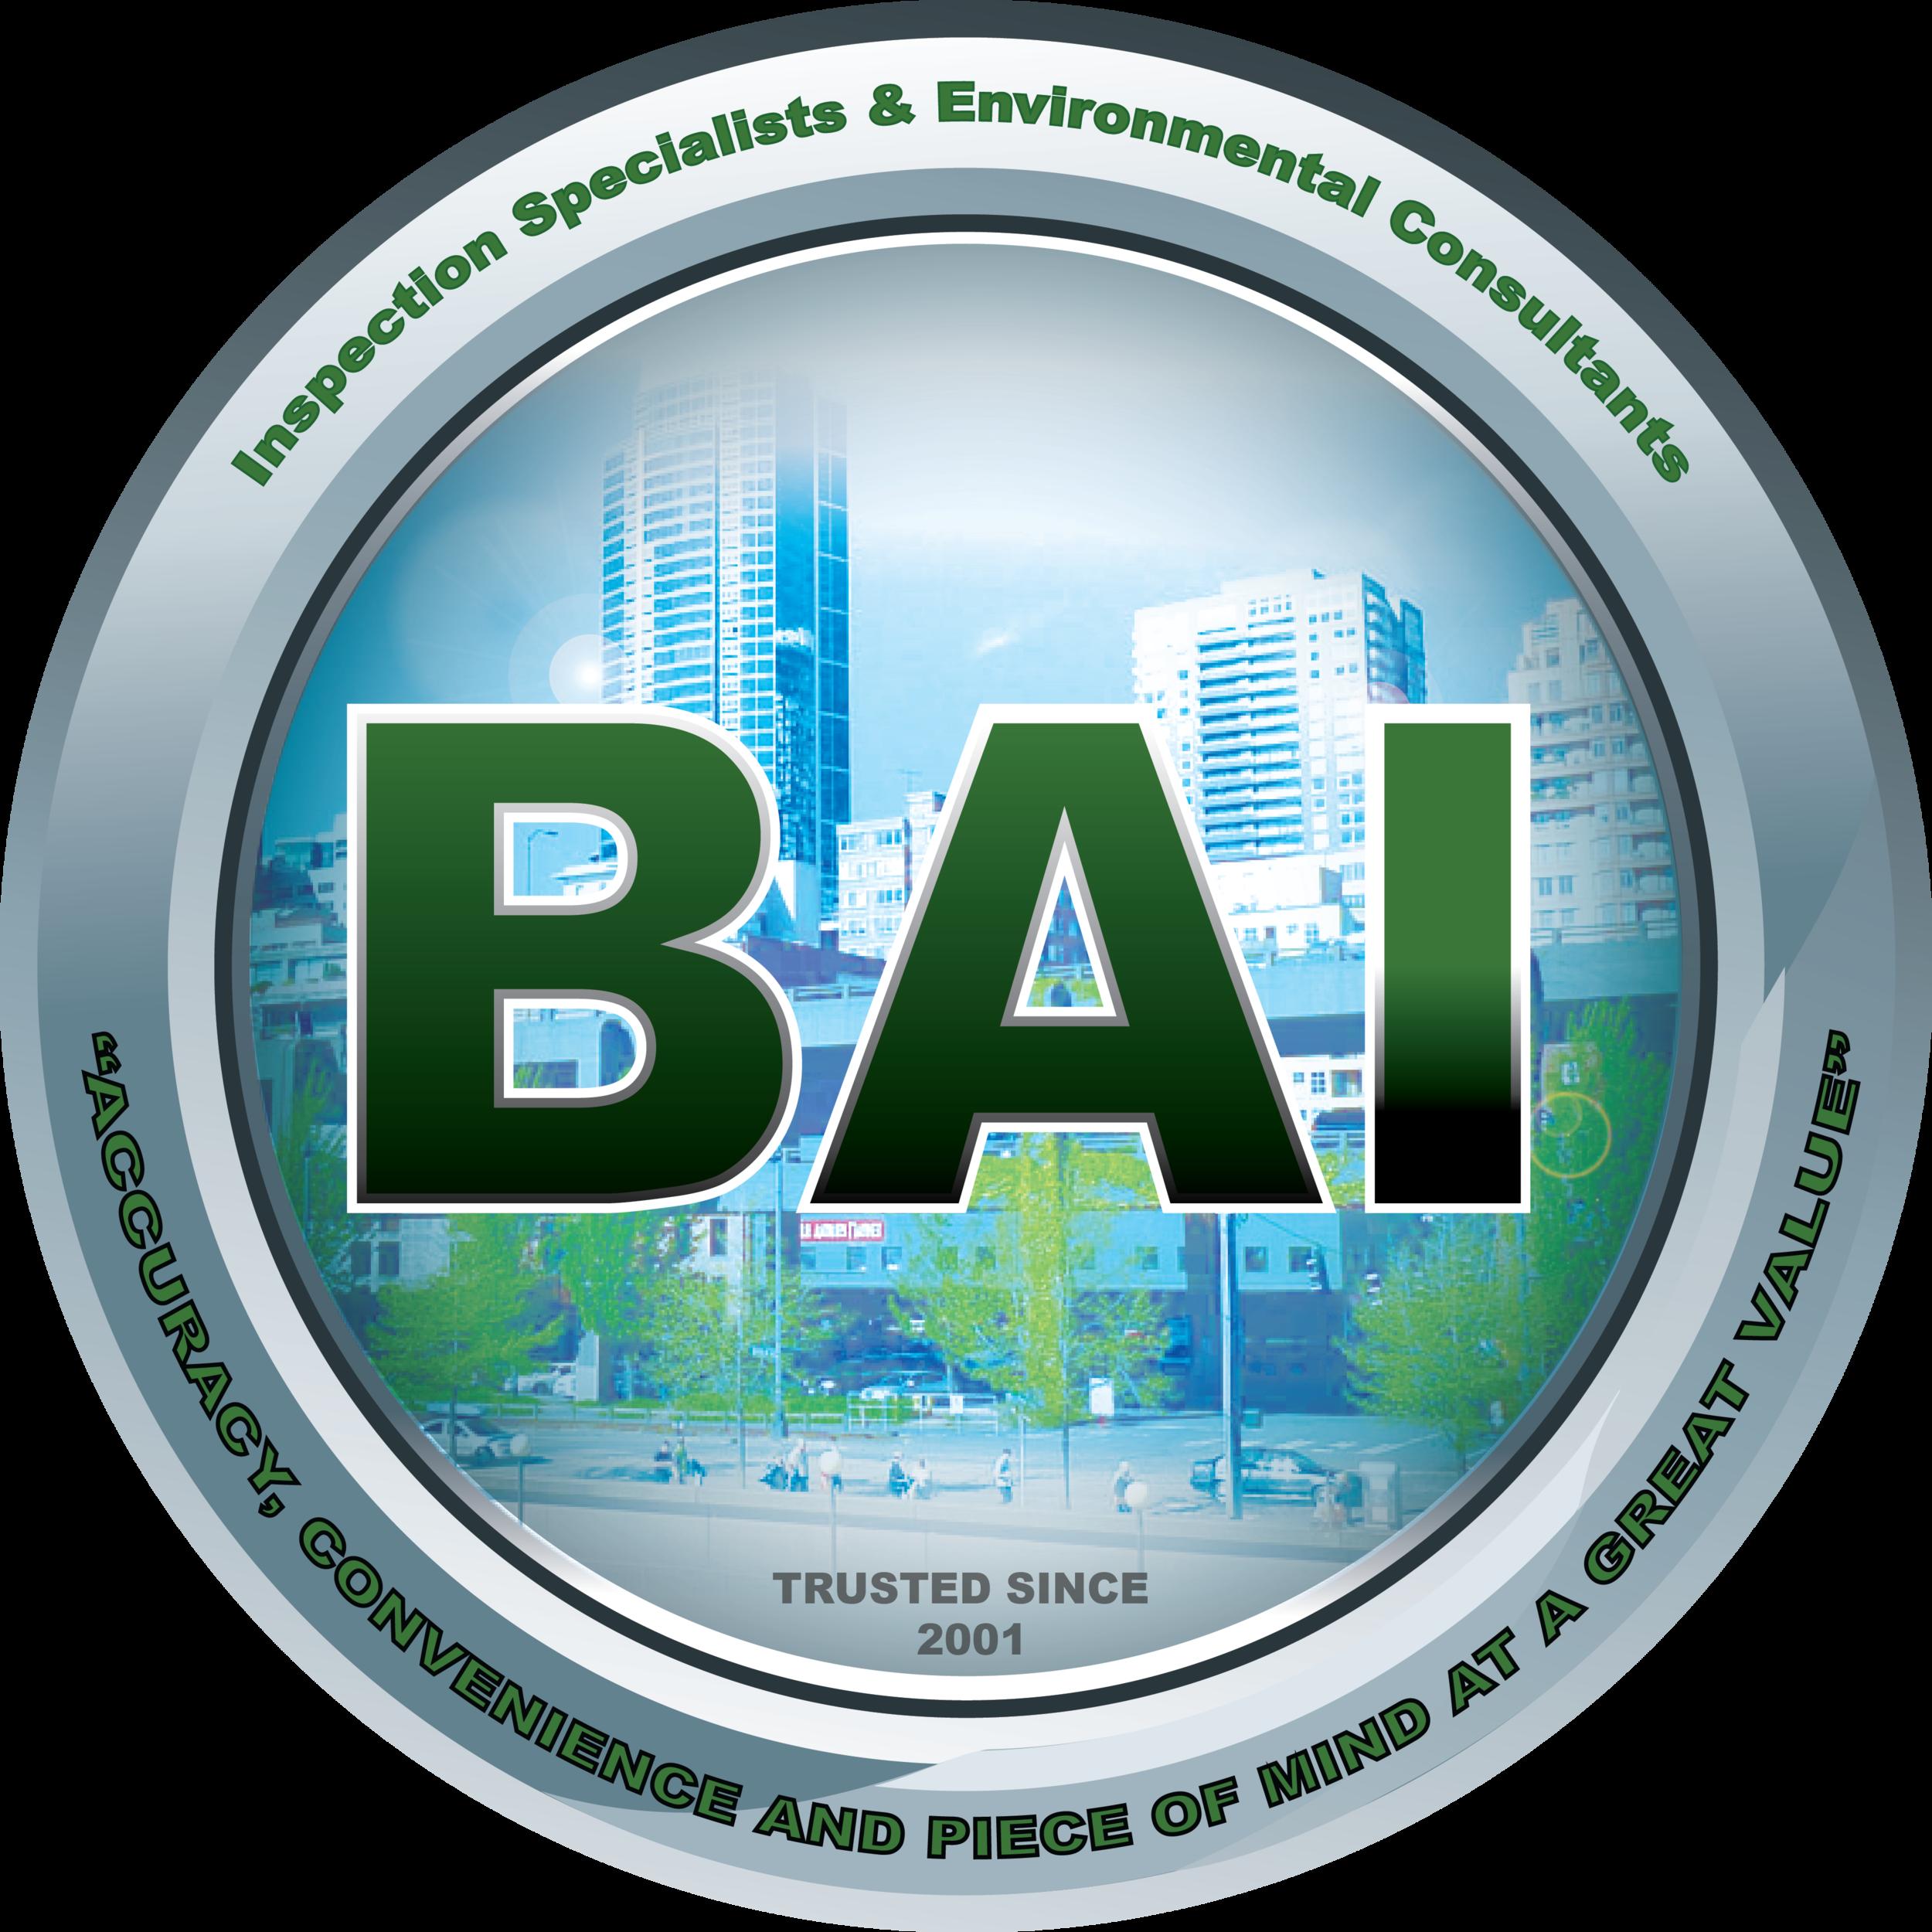 baicommercialinspectionslogo.png